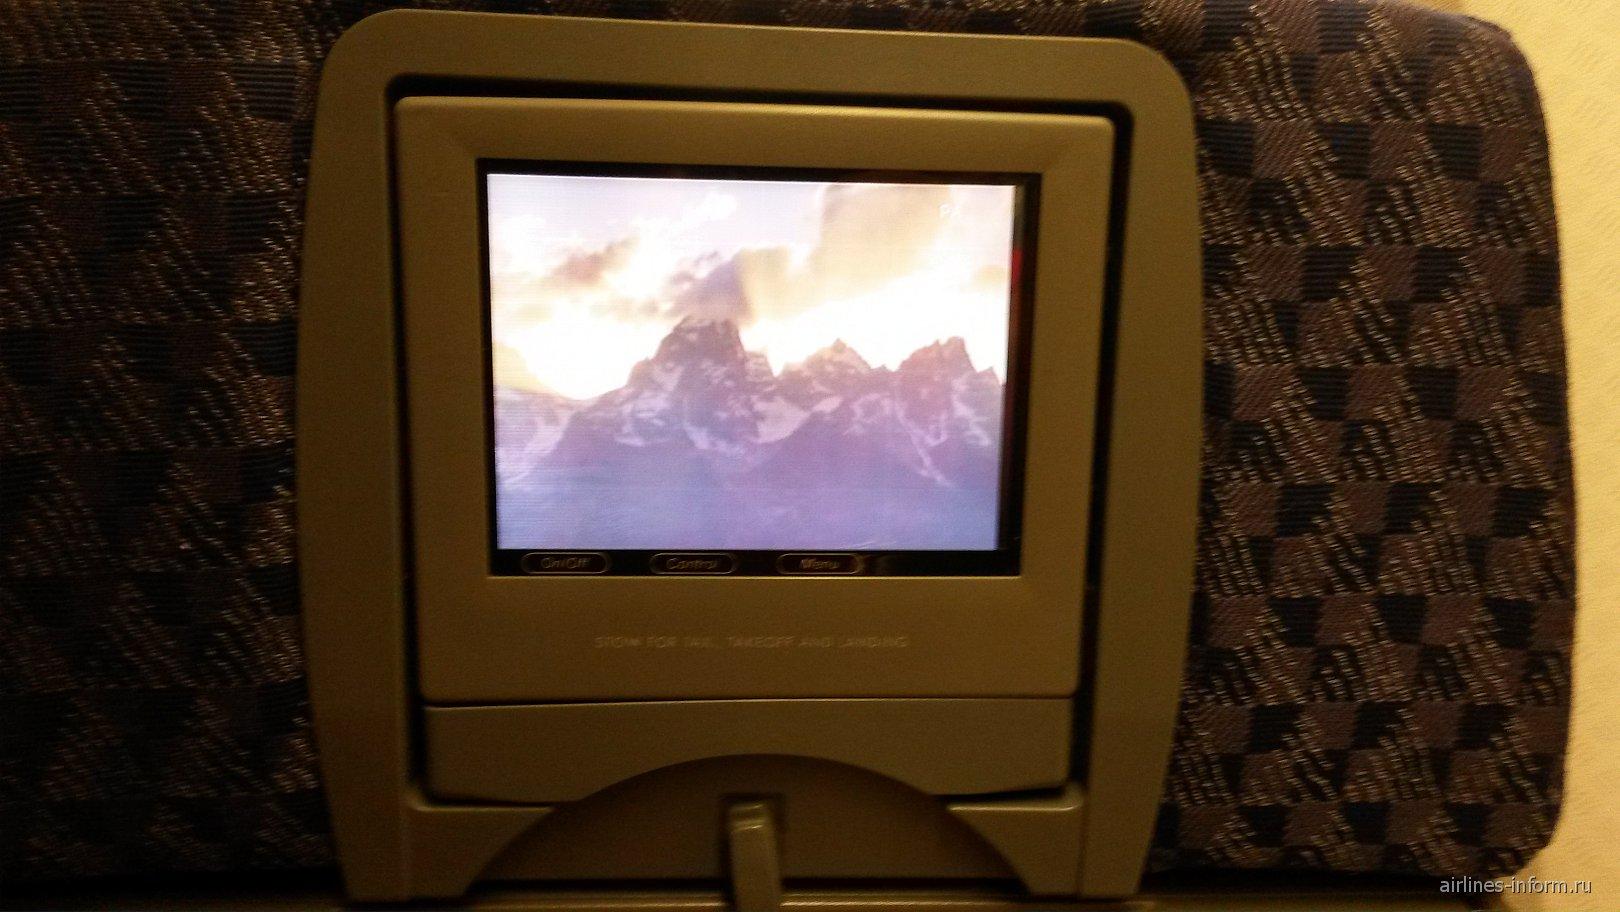 Система развлечений самолета Боинг-777-200 авиакомпании American Airlines